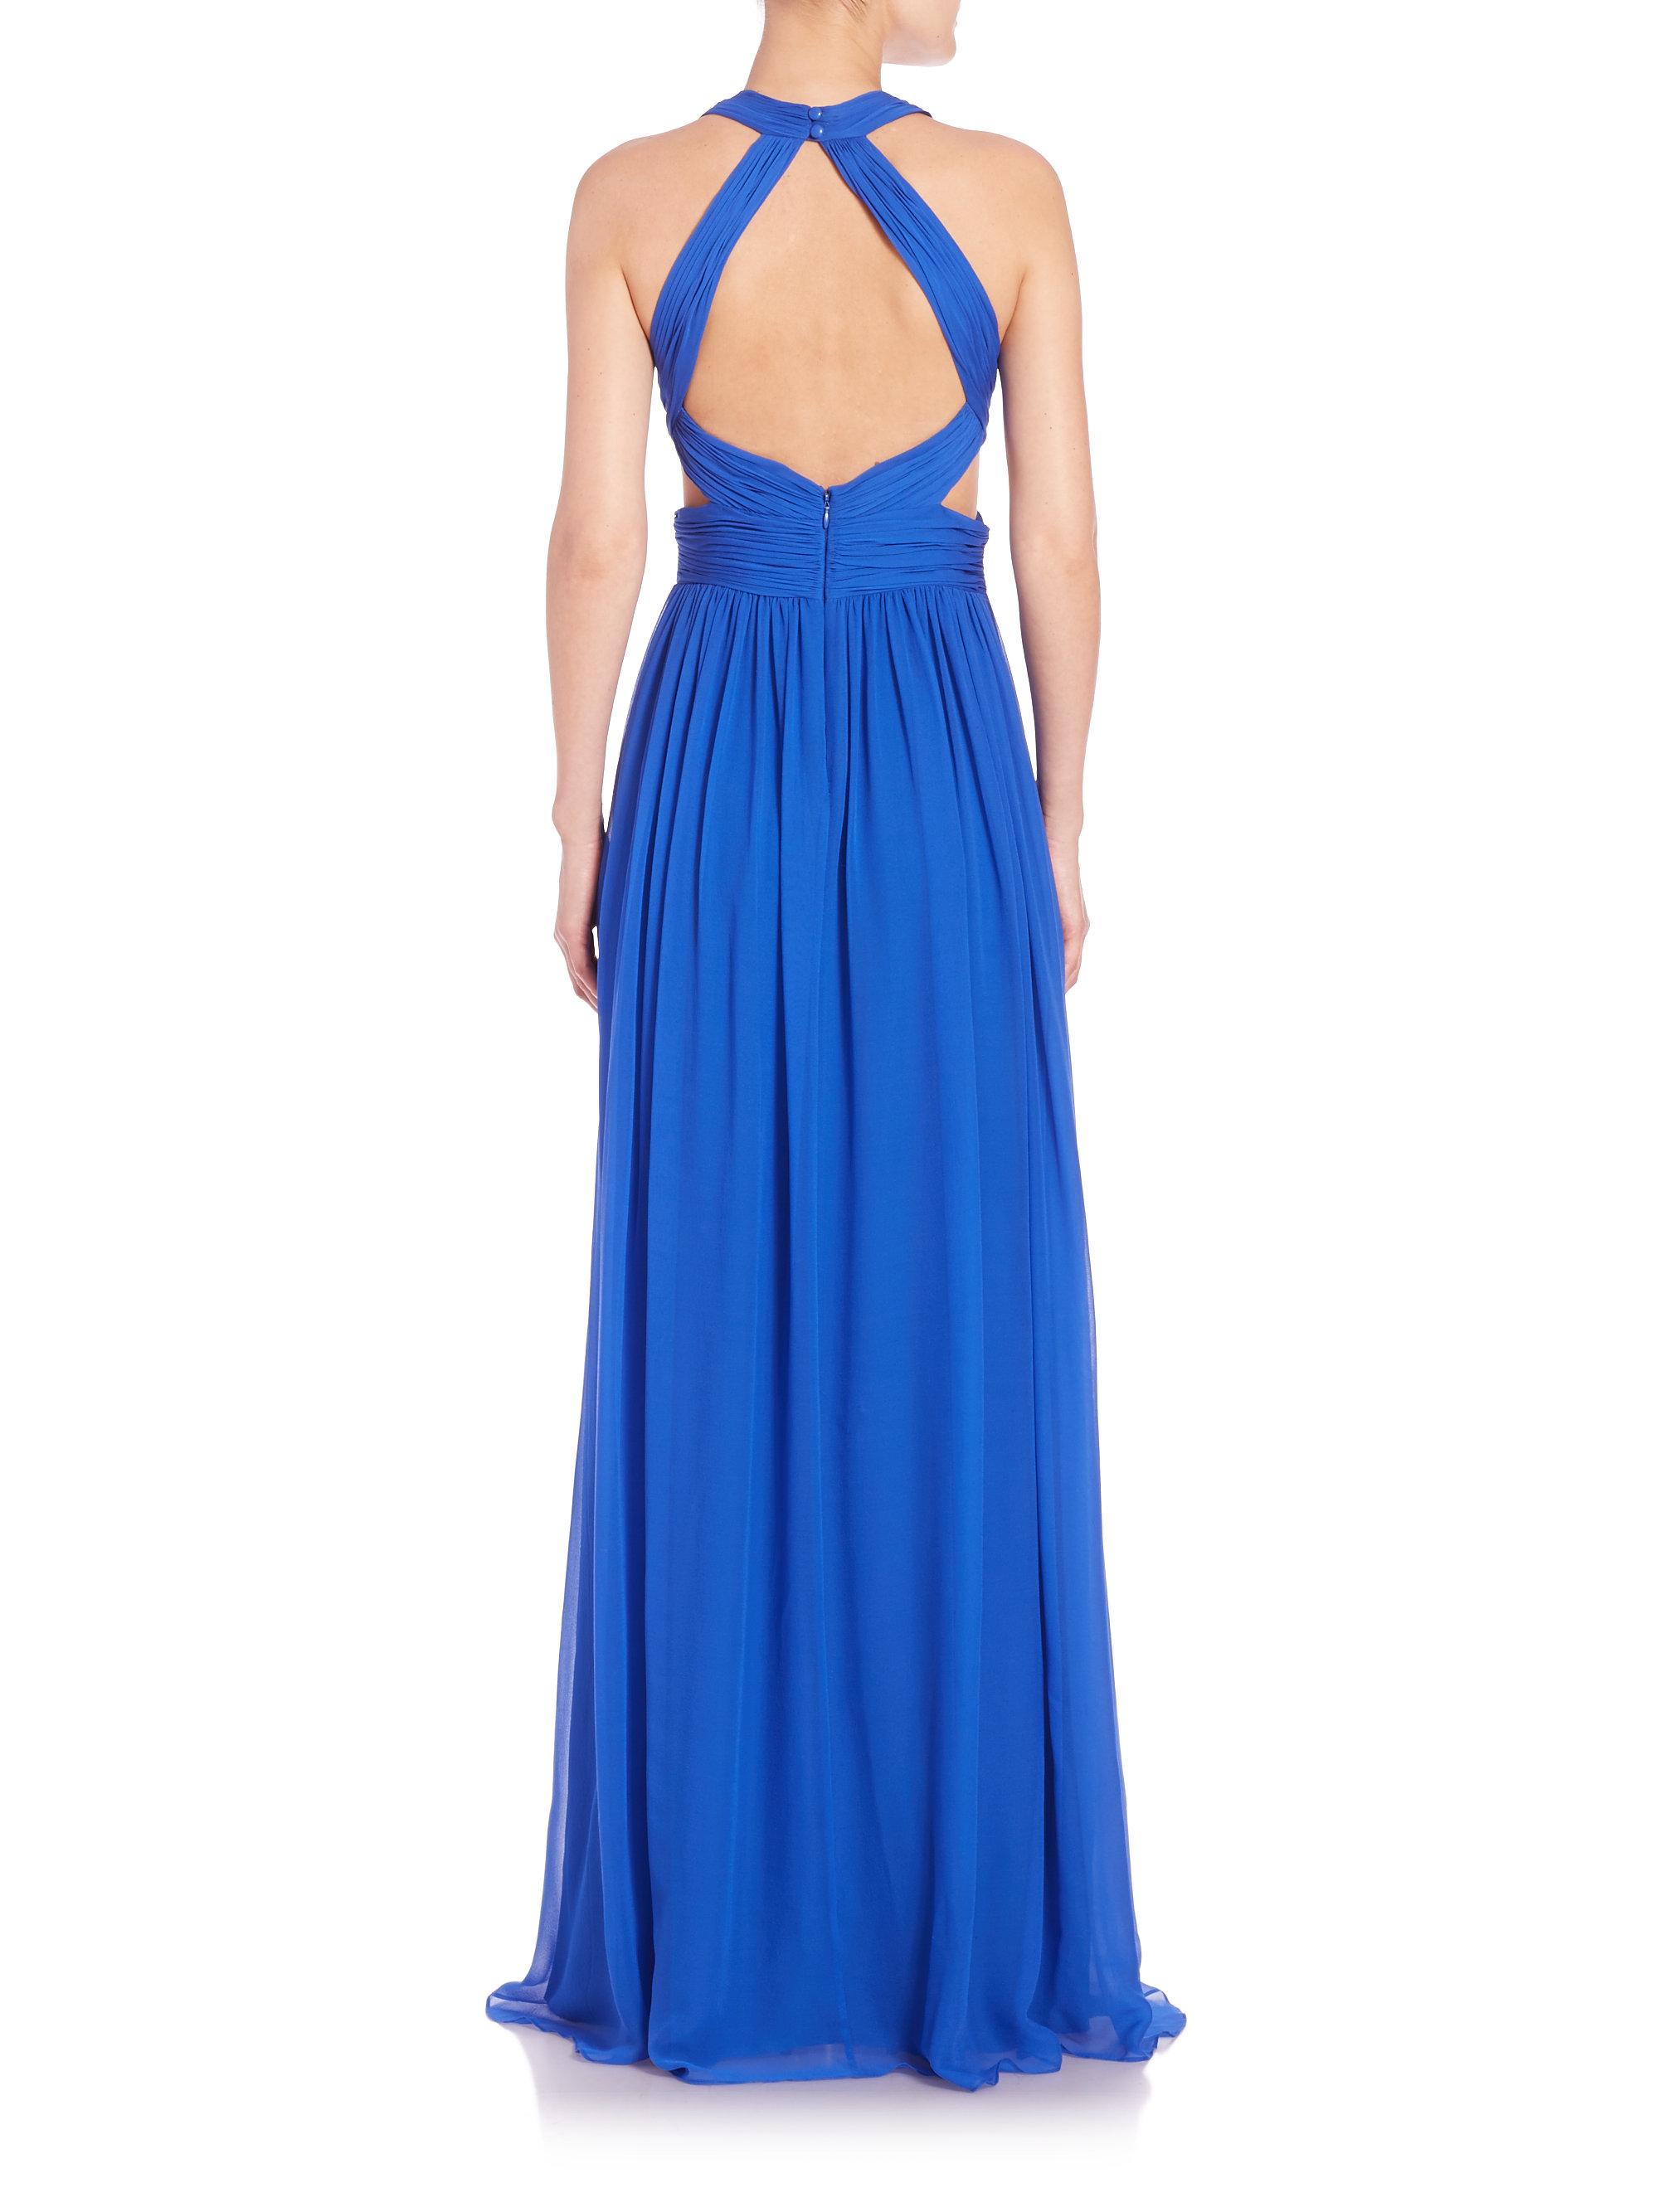 Aidan mattox Chiffon Halter Gown in Blue | Lyst